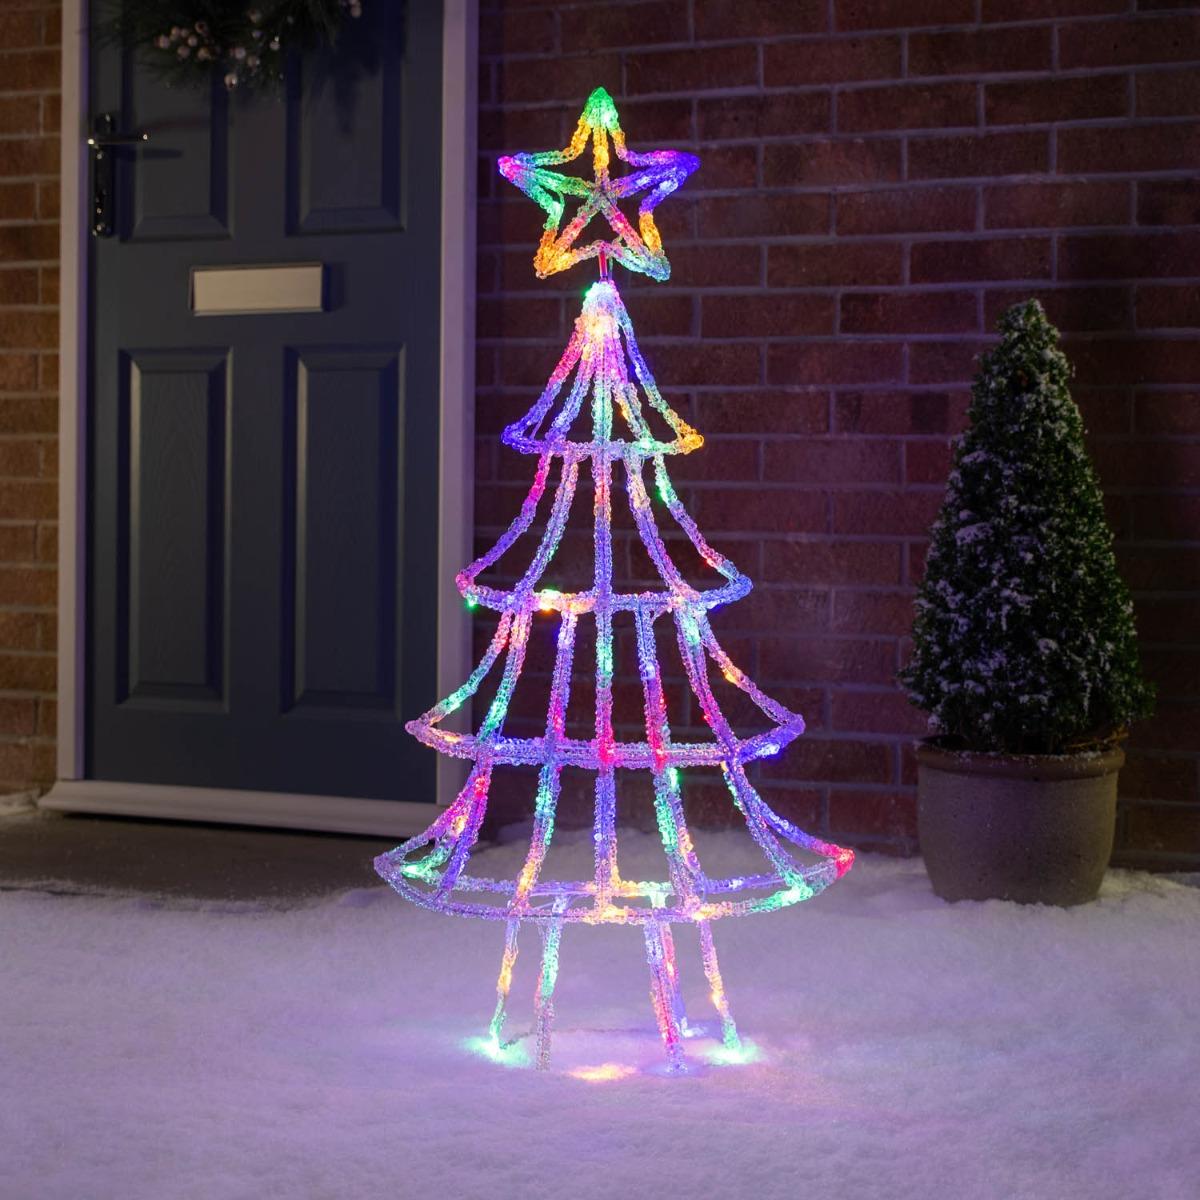 Image of 1m 3D Acrylic LED Christmas Tree